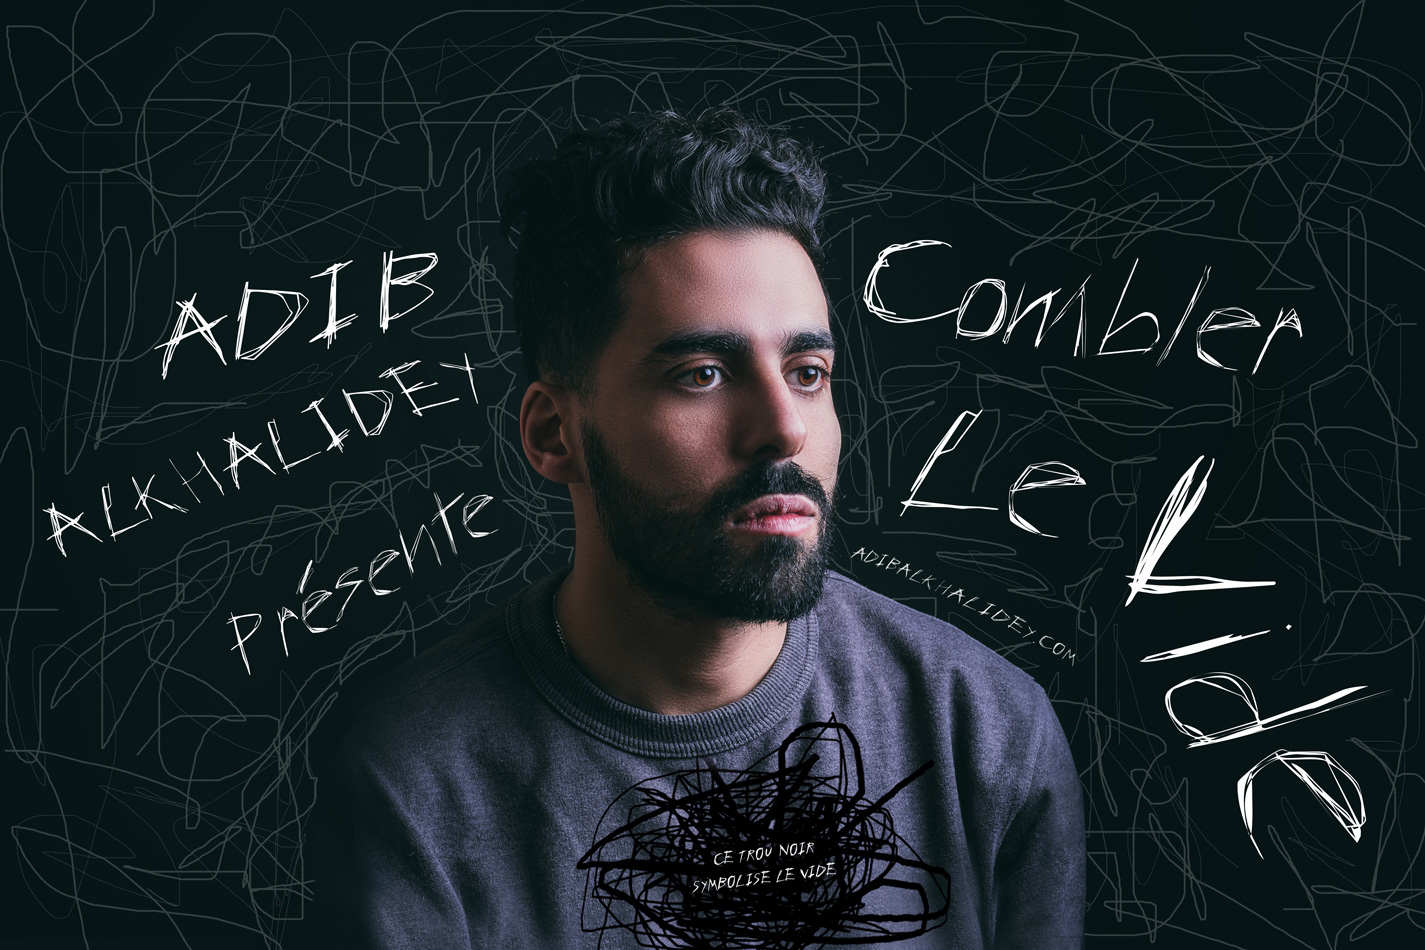 zoofest adib alkhalidey poster